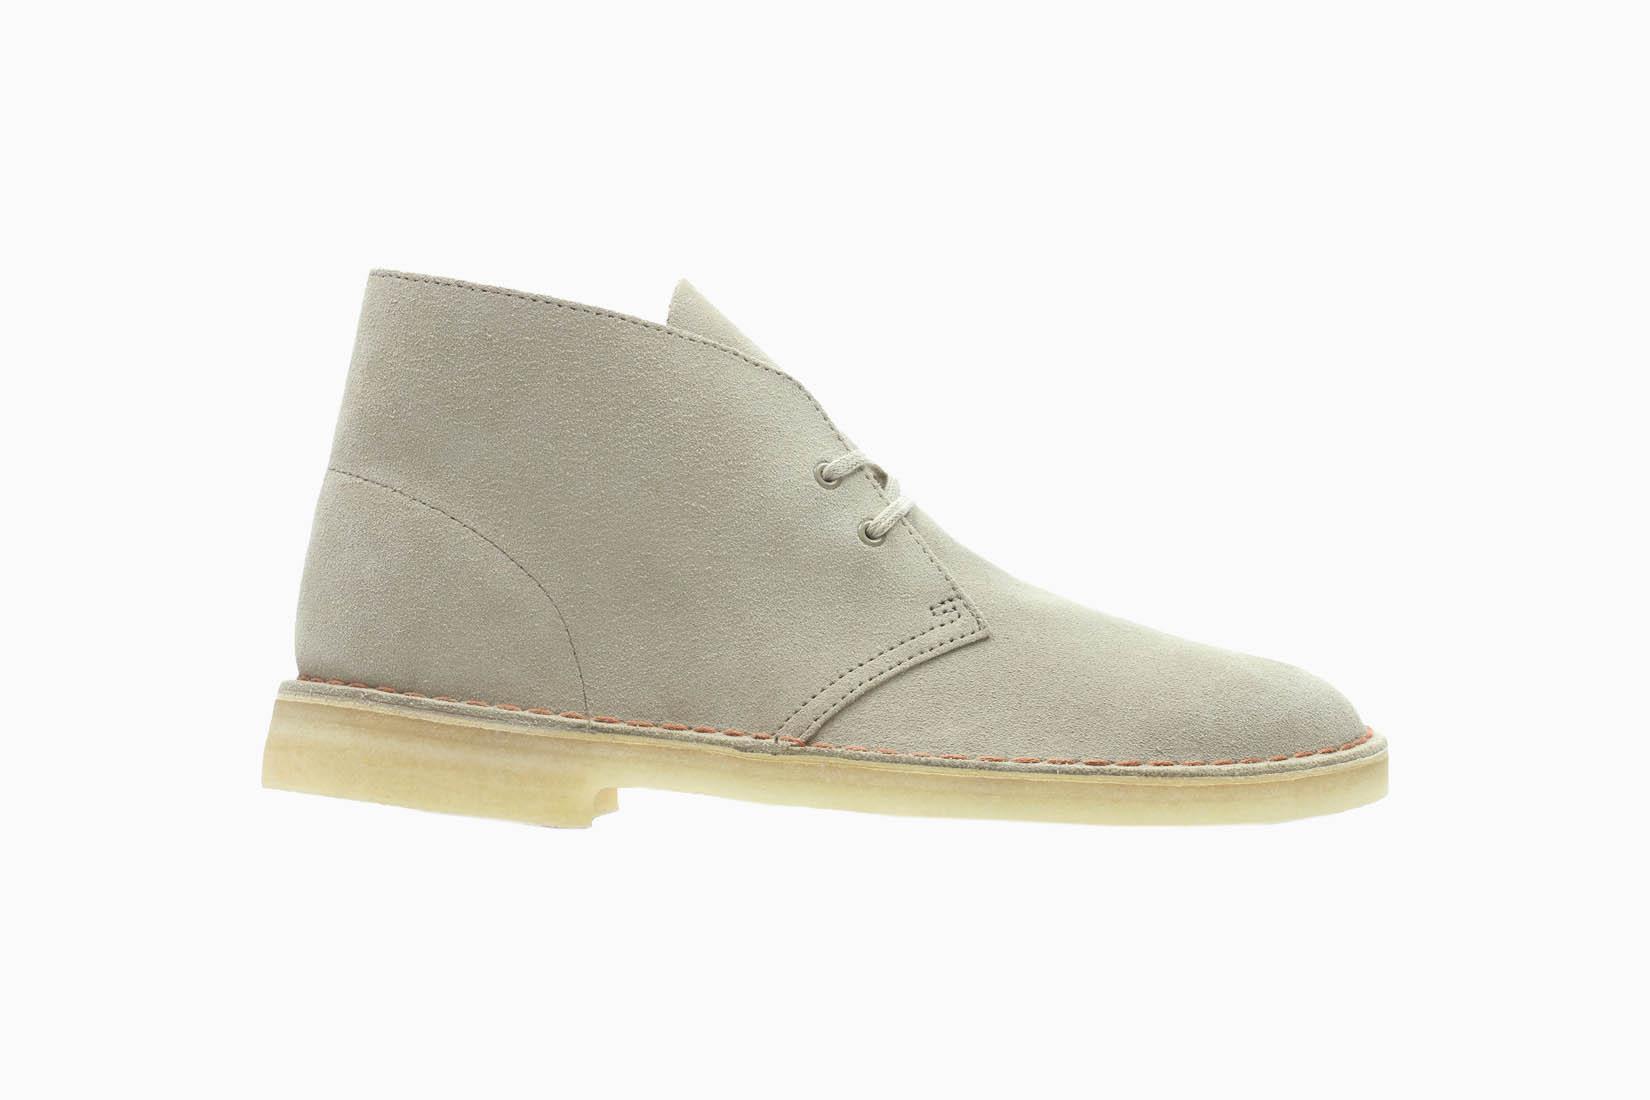 best casual shoes men clarks desert boot review Luxe Digital